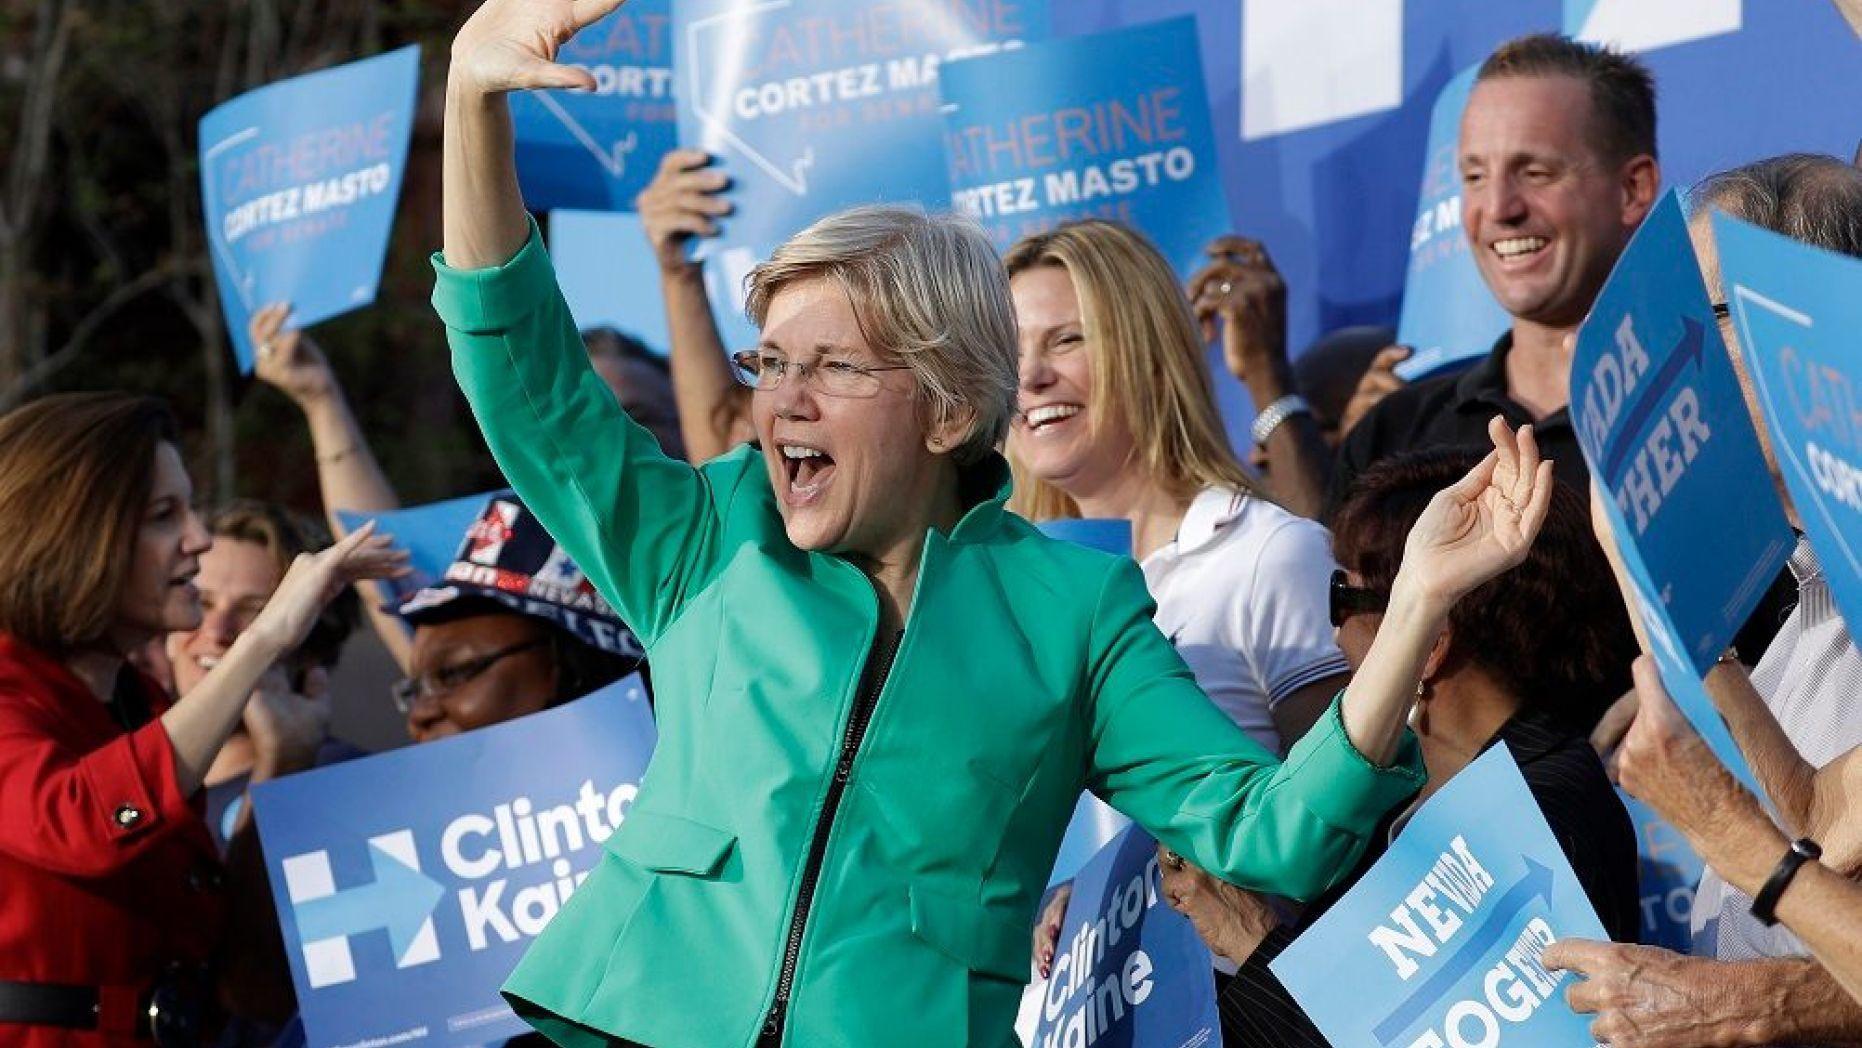 Elizabeth Warren heckled at campaign stop 'Why